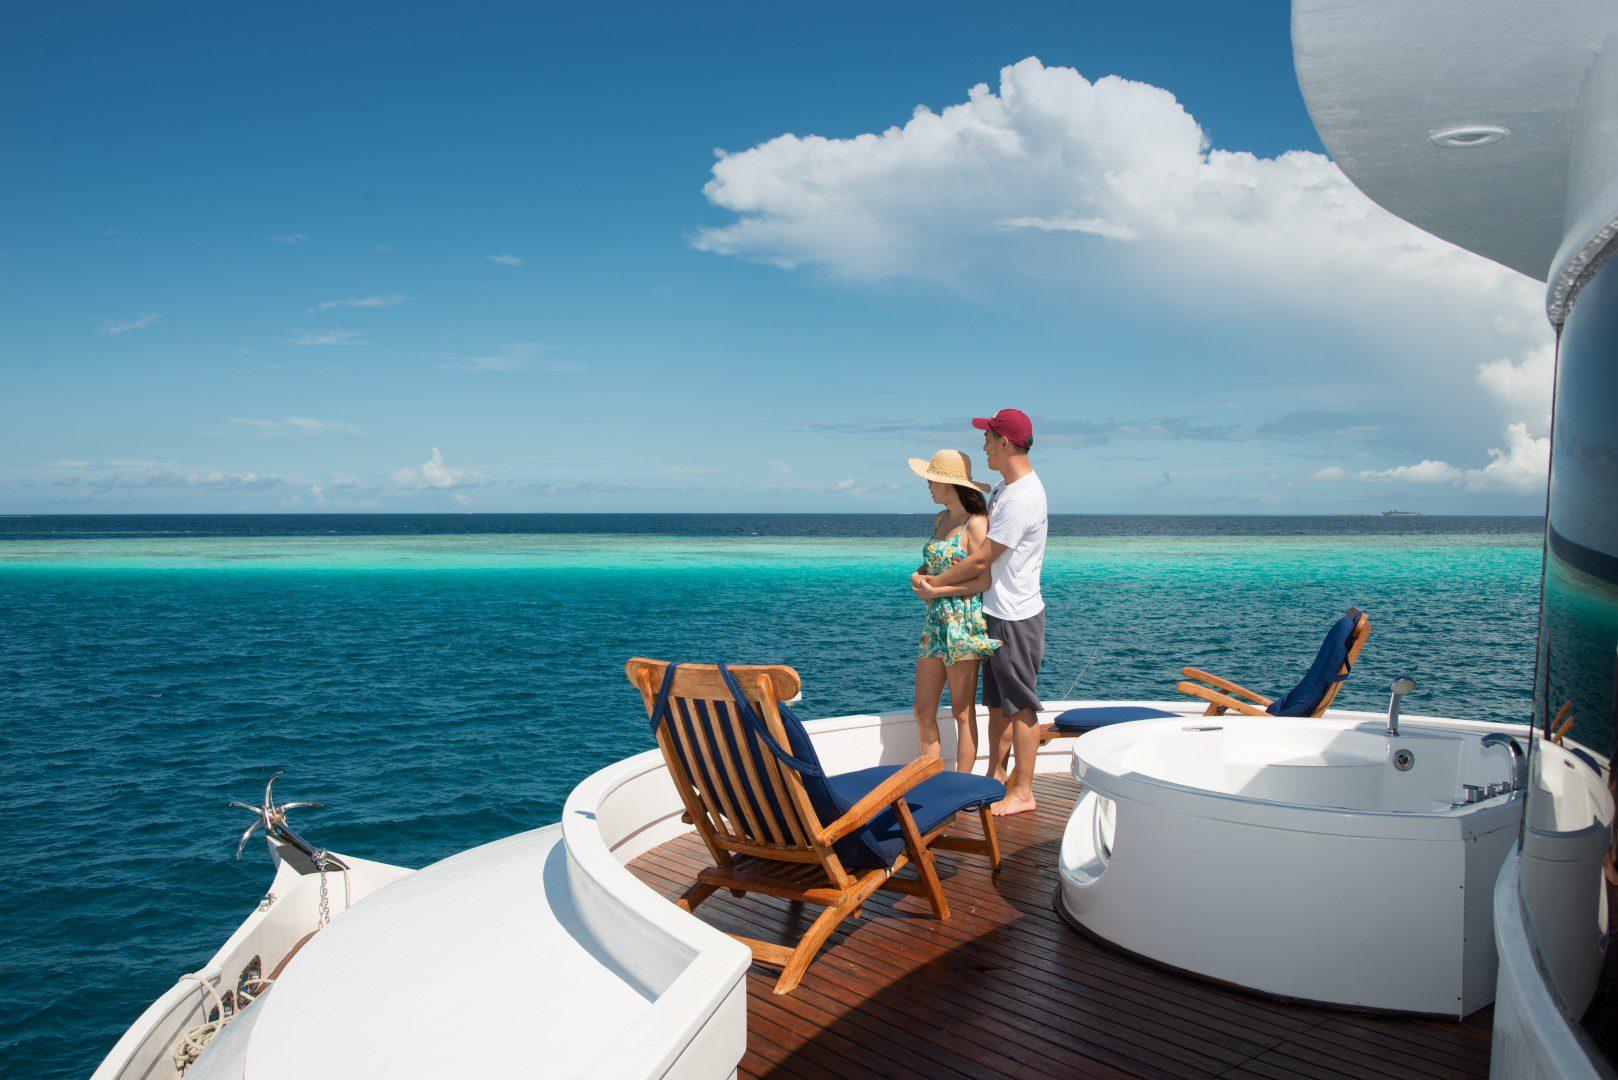 Фото туристов на яхте